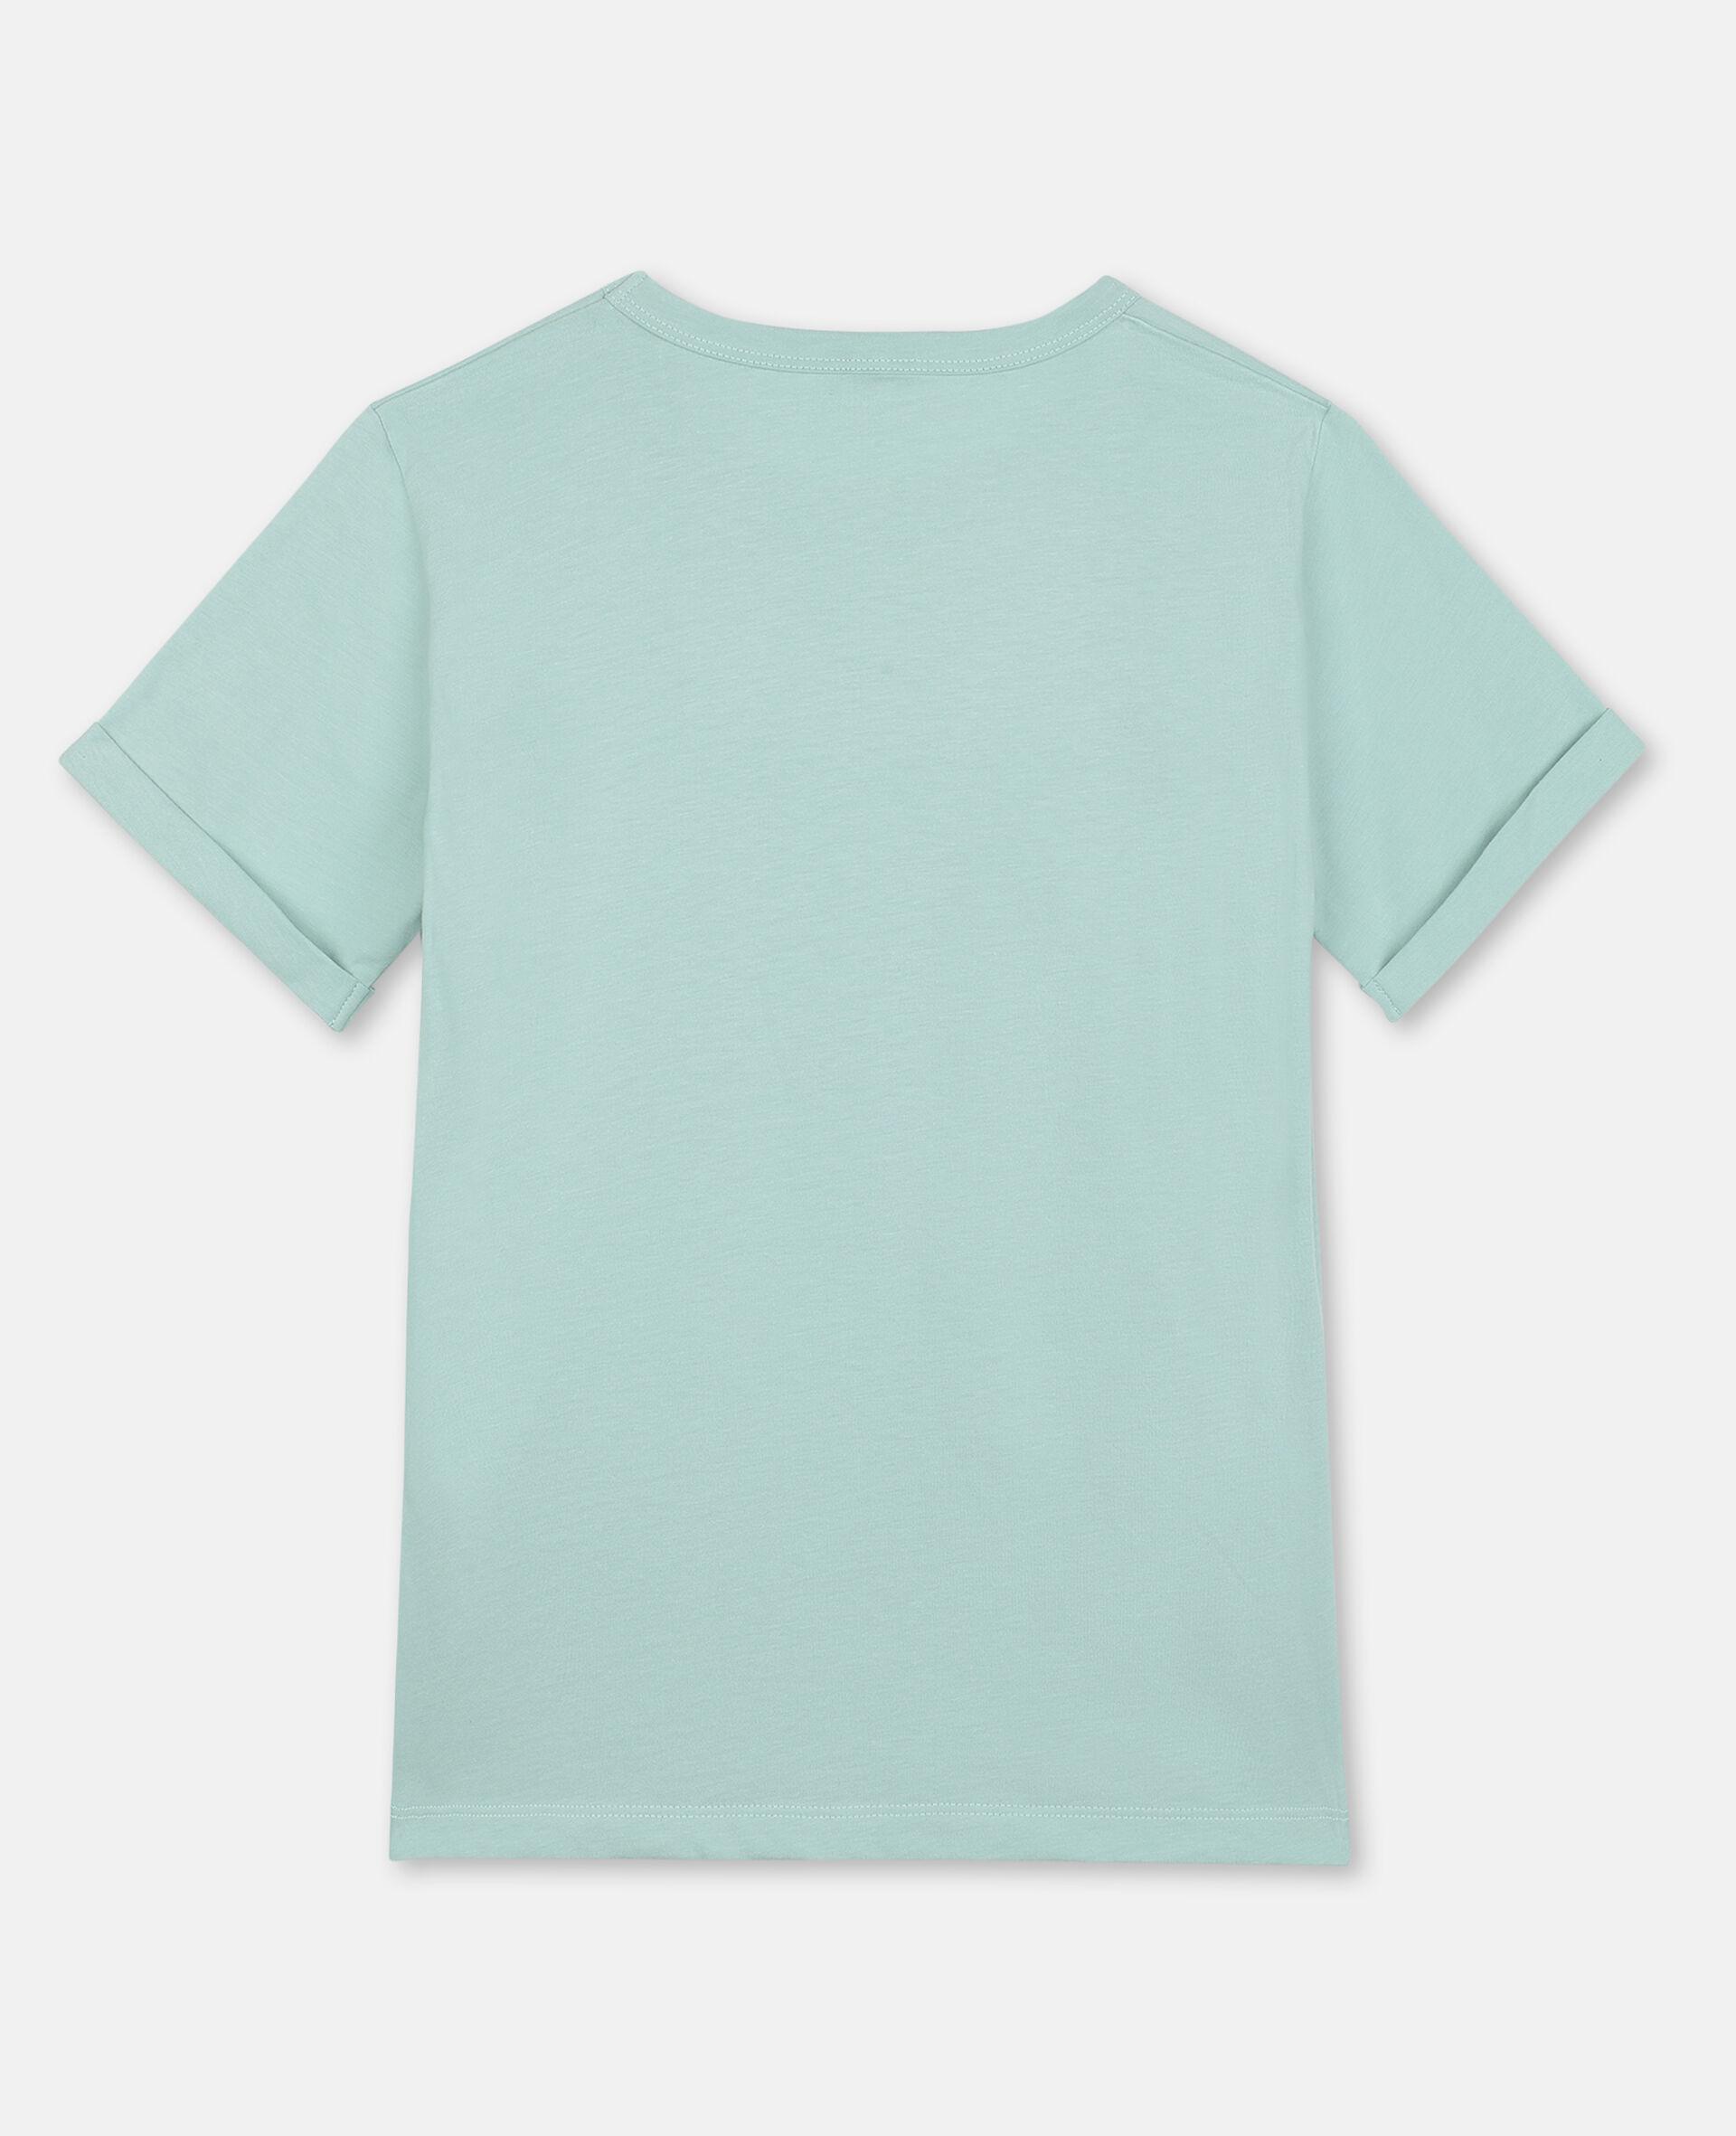 Baumwoll-T-Shirt mit Schmetterling-Print-Grün-large image number 3